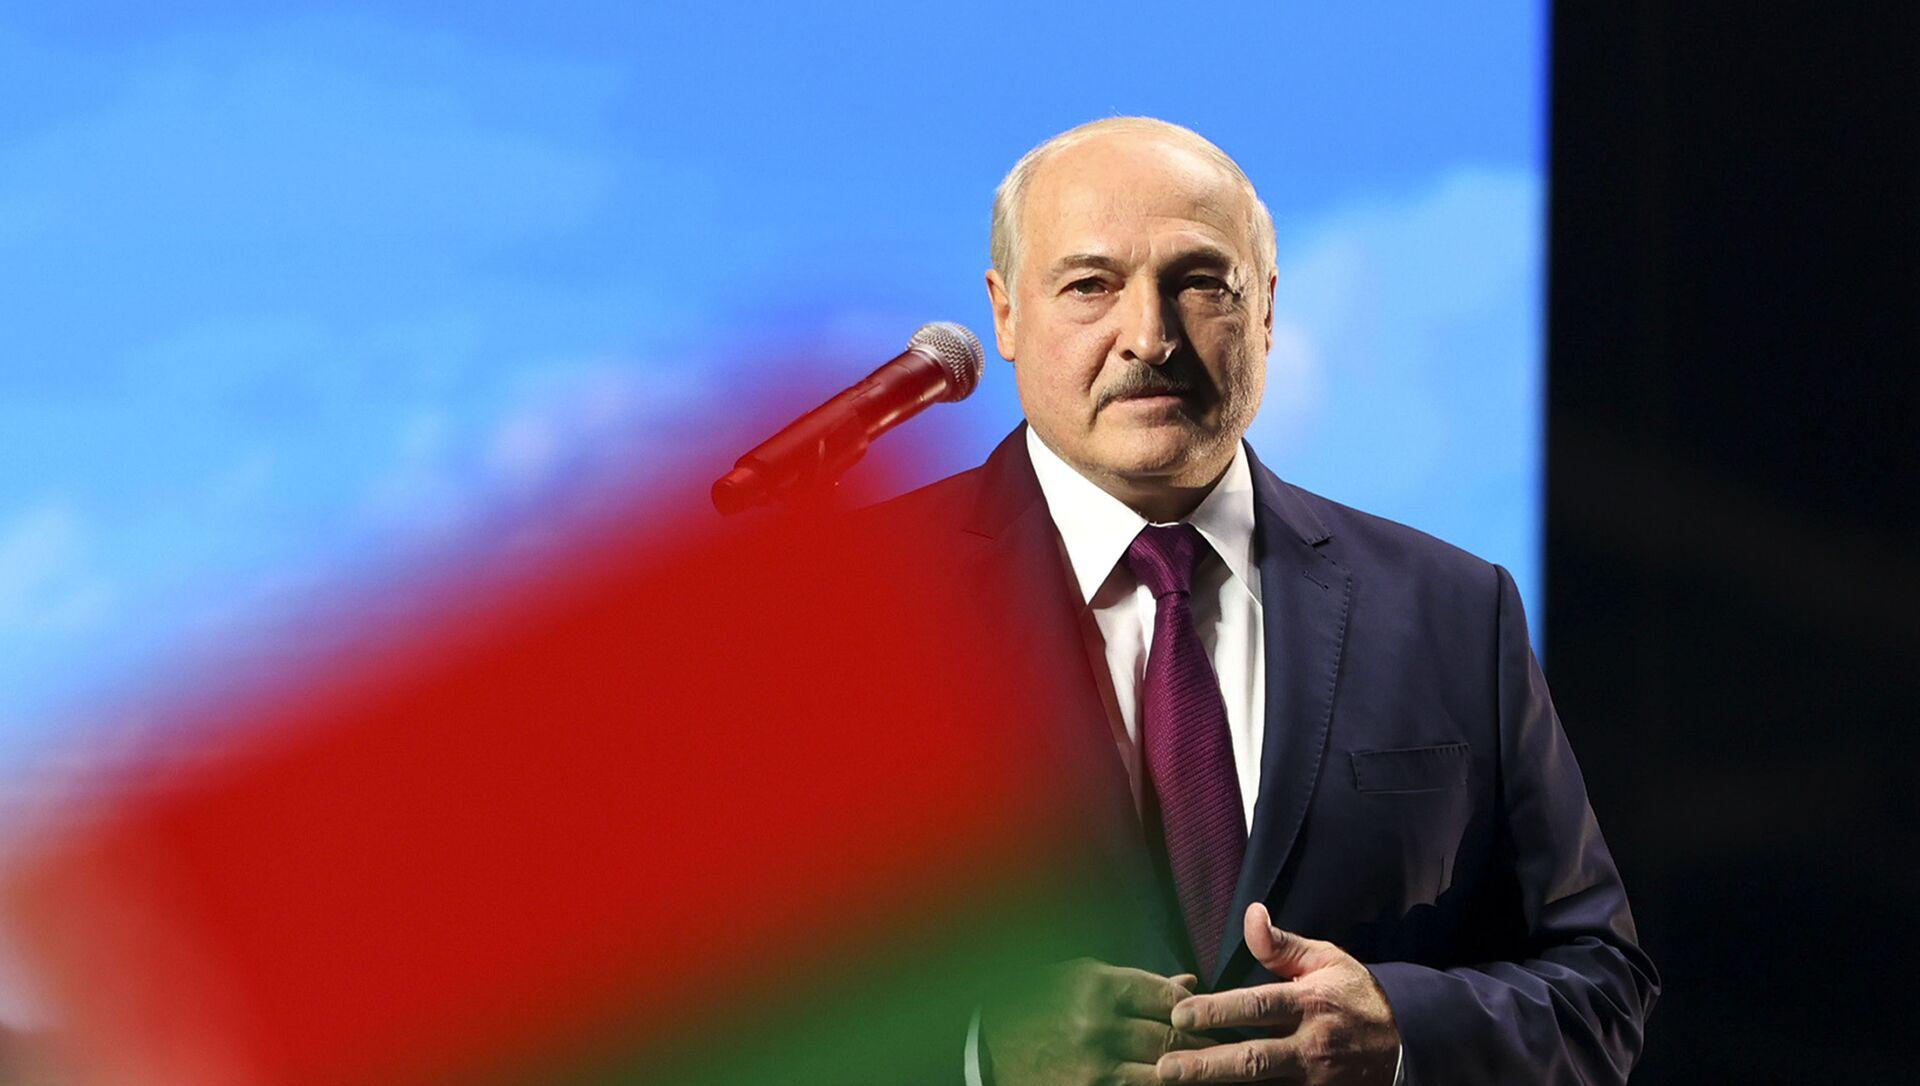 Президент Белоруссии Александр Лукашенко, фото из архива - Sputnik Азербайджан, 1920, 10.08.2021